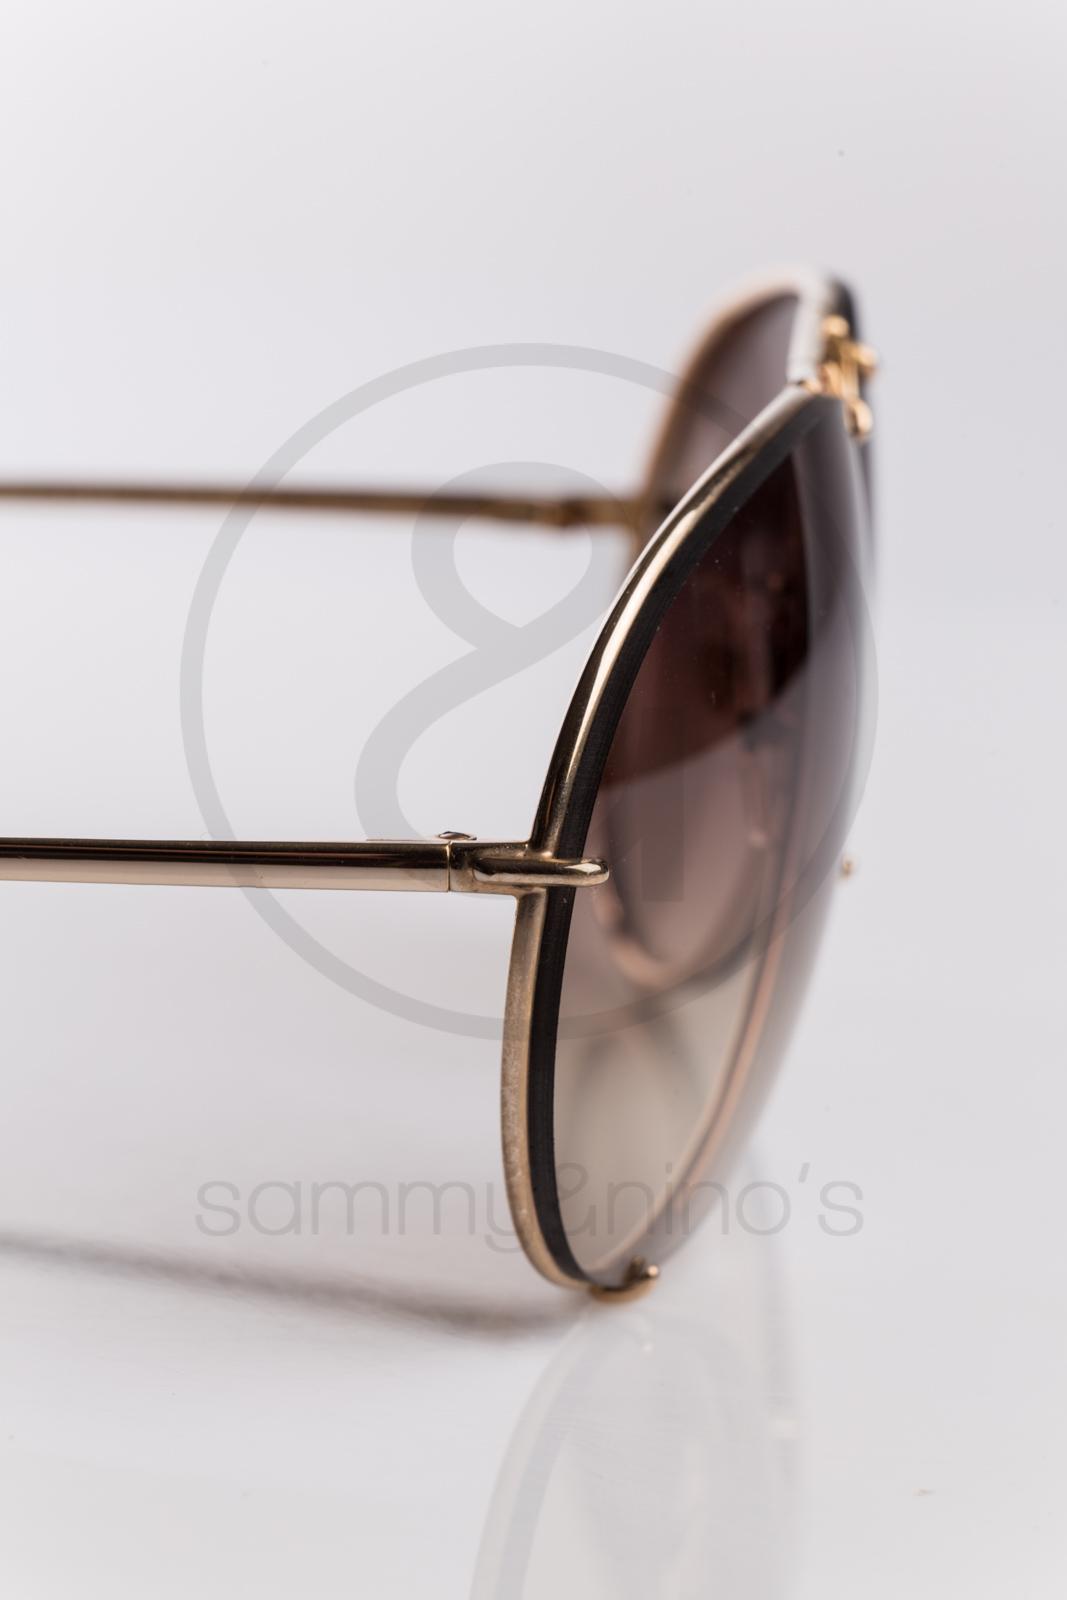 Vintage Porsche Carrera Sunglasses  porsche carrera 5621 sammy nino s